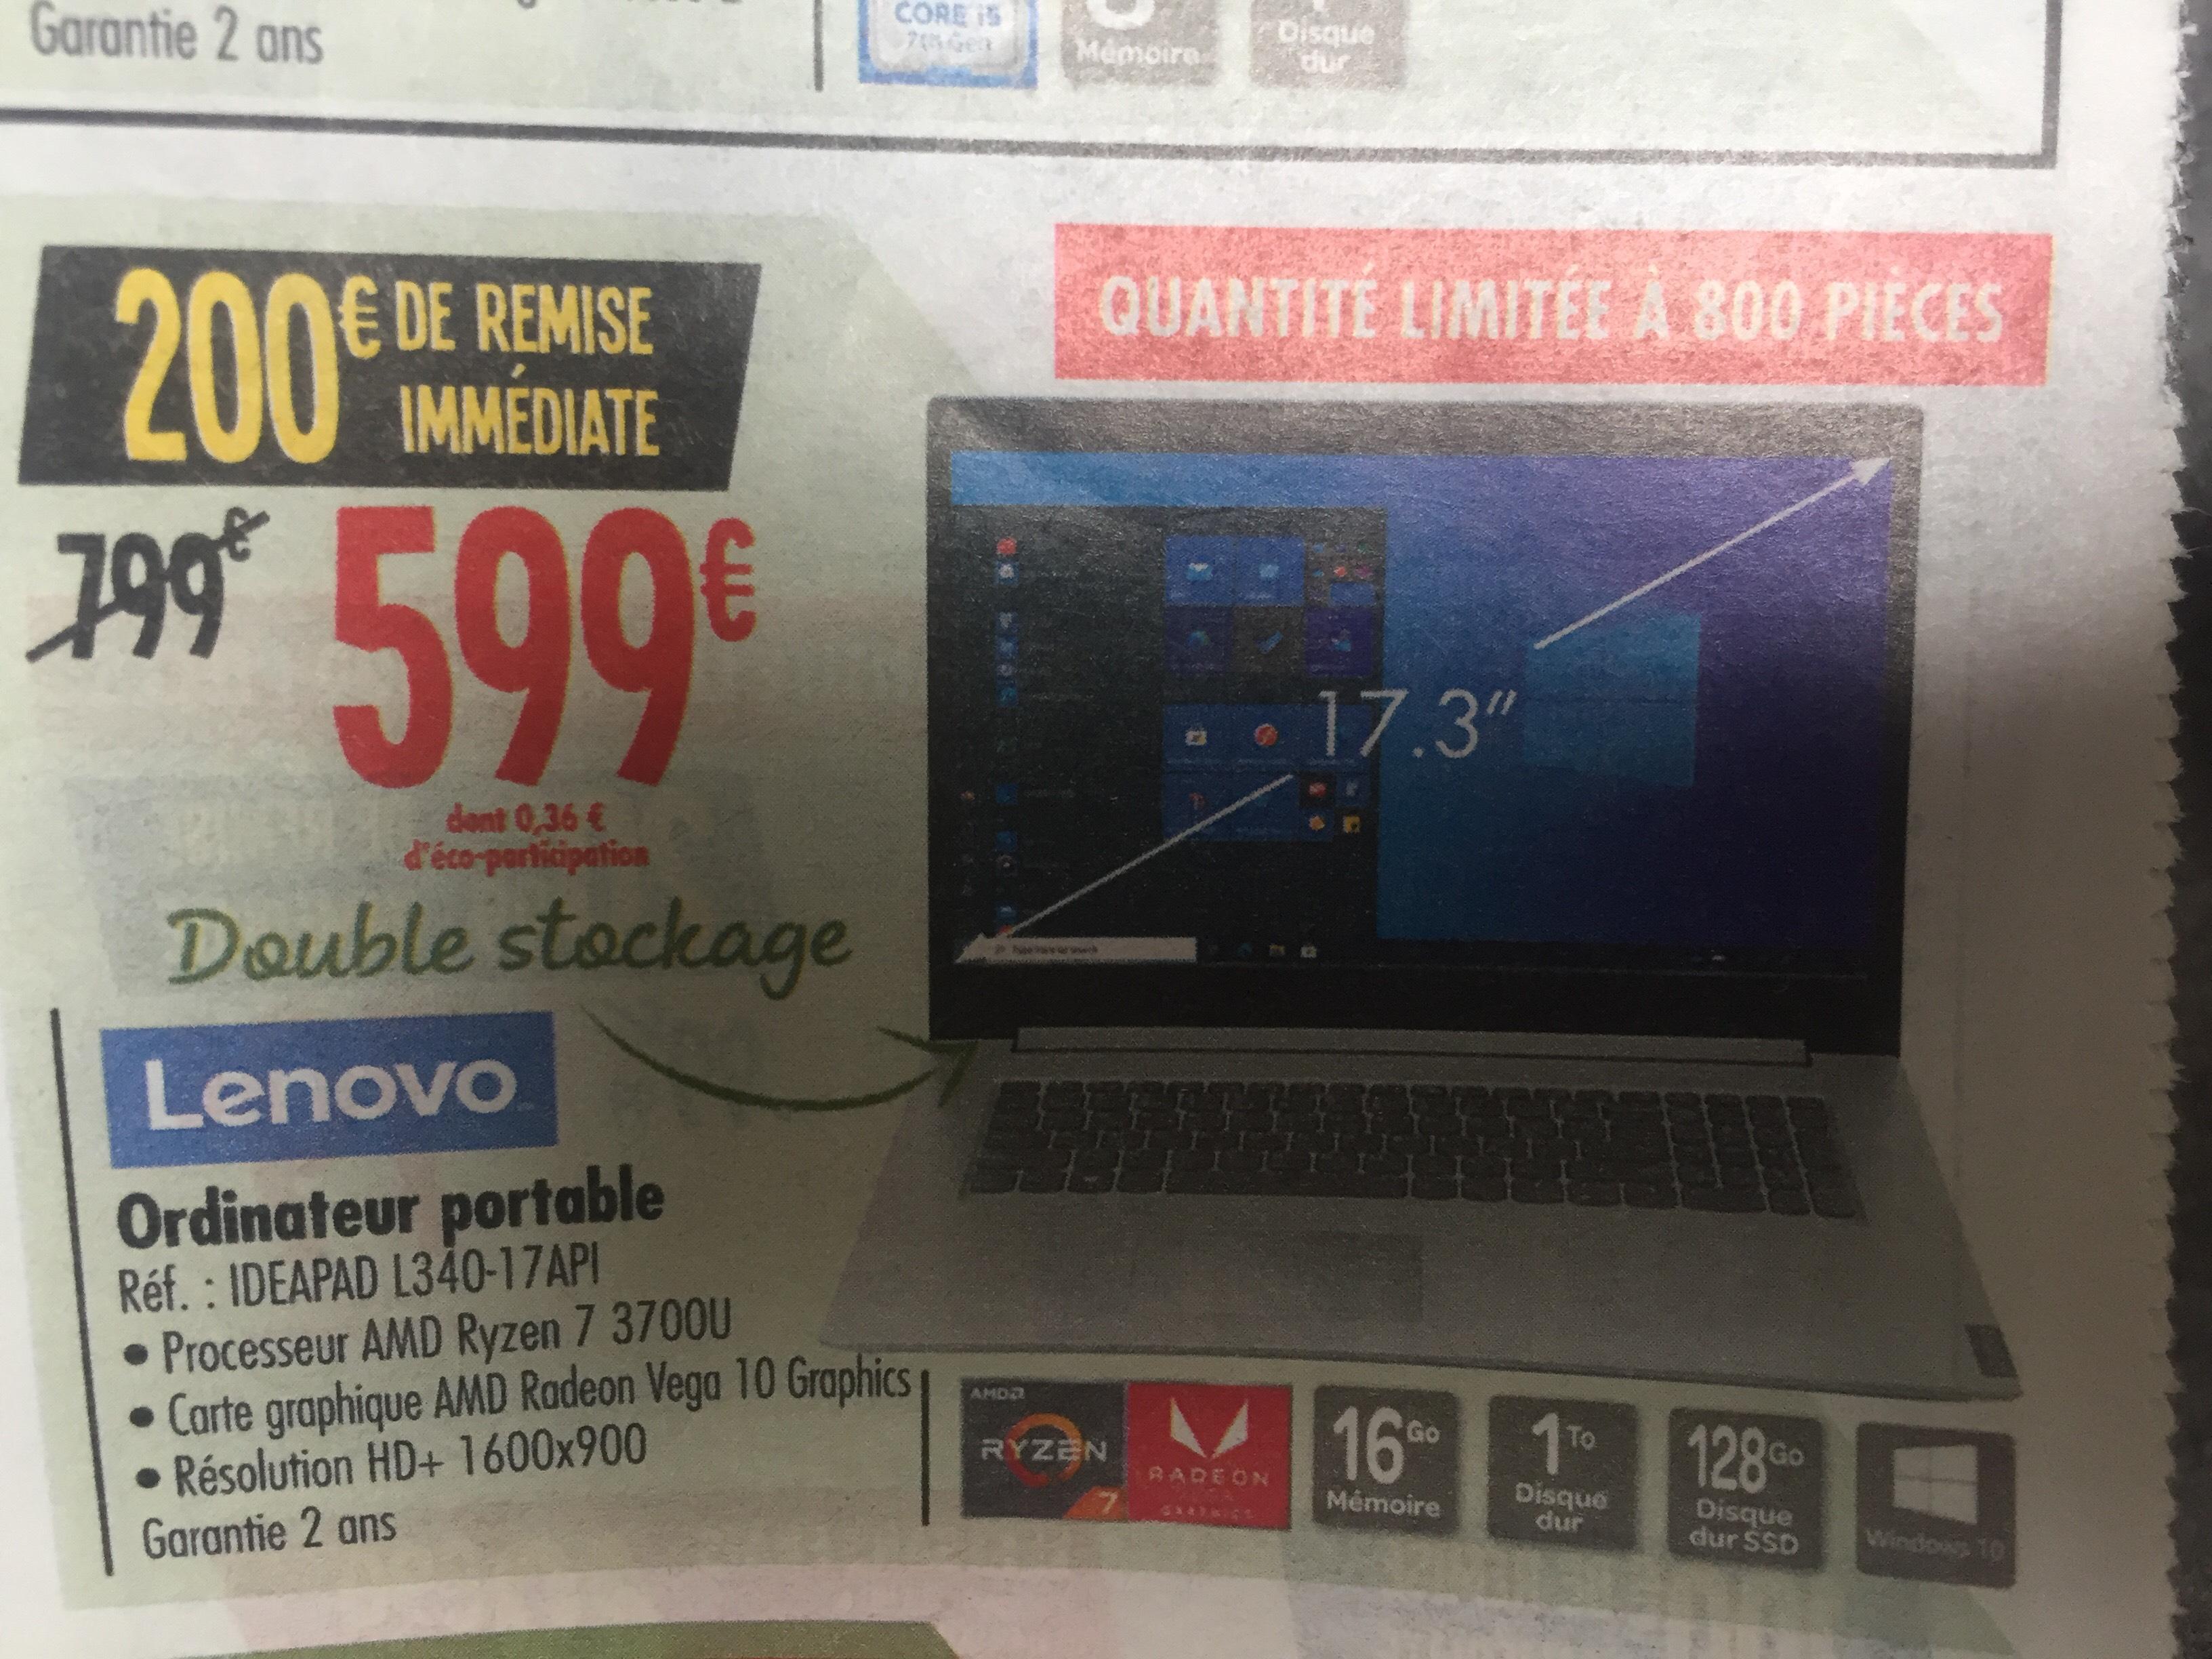 "Sélection de PC en promotion - Ex: PC Portable 17.3"" Lenovo IdeaPad L340-17API - Ryzen 7 3700U, RX Vega 10, 16 Go RAM, 1 To HDD + 128 Go SSD"